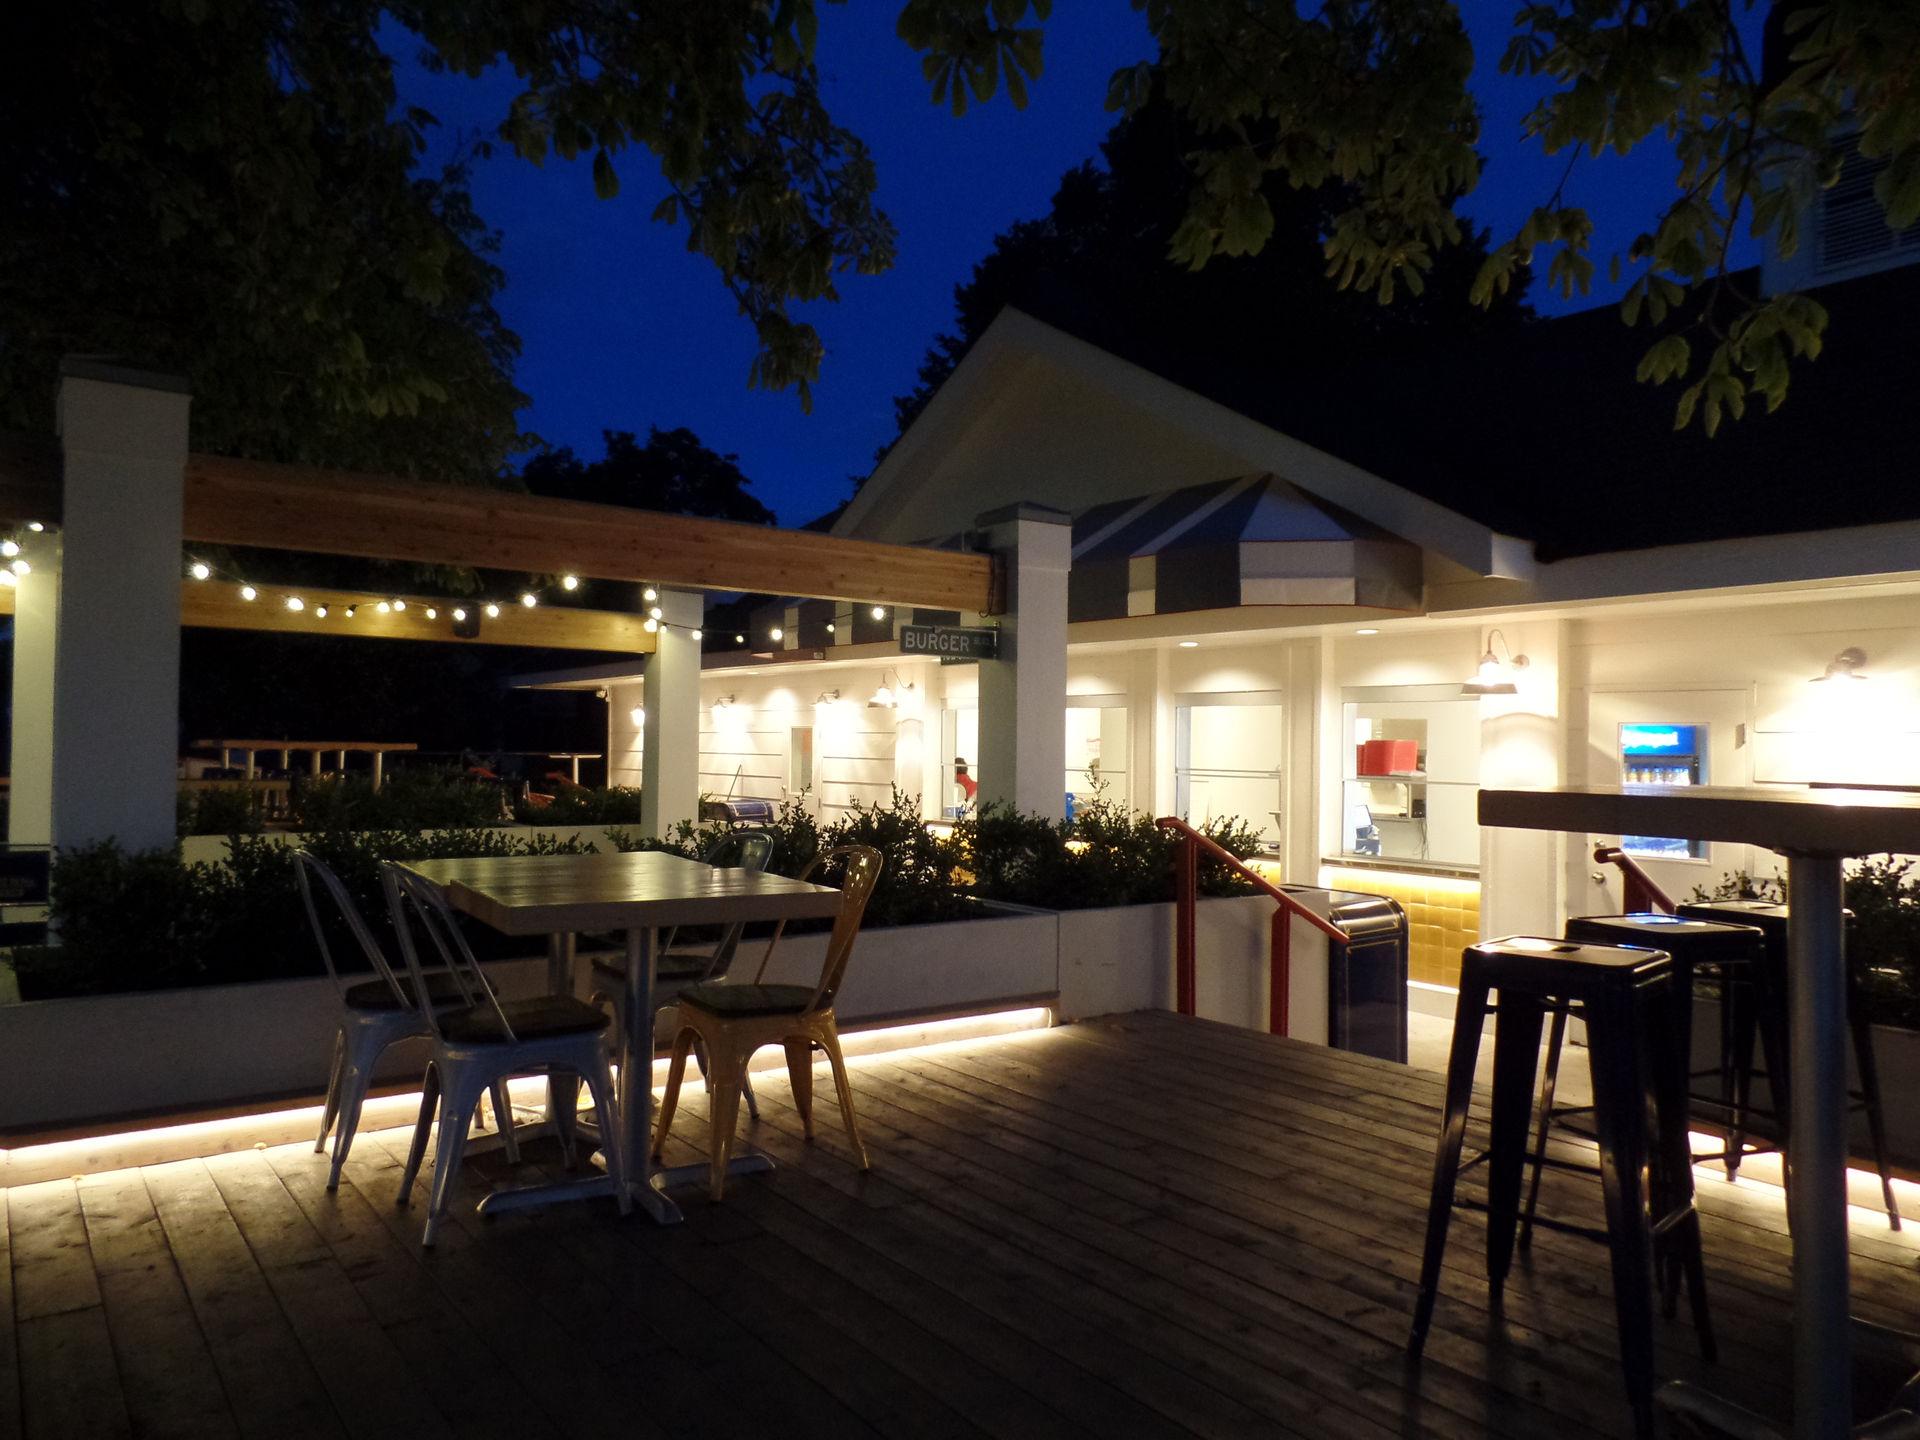 Outdoor Burger Cafe at dusk